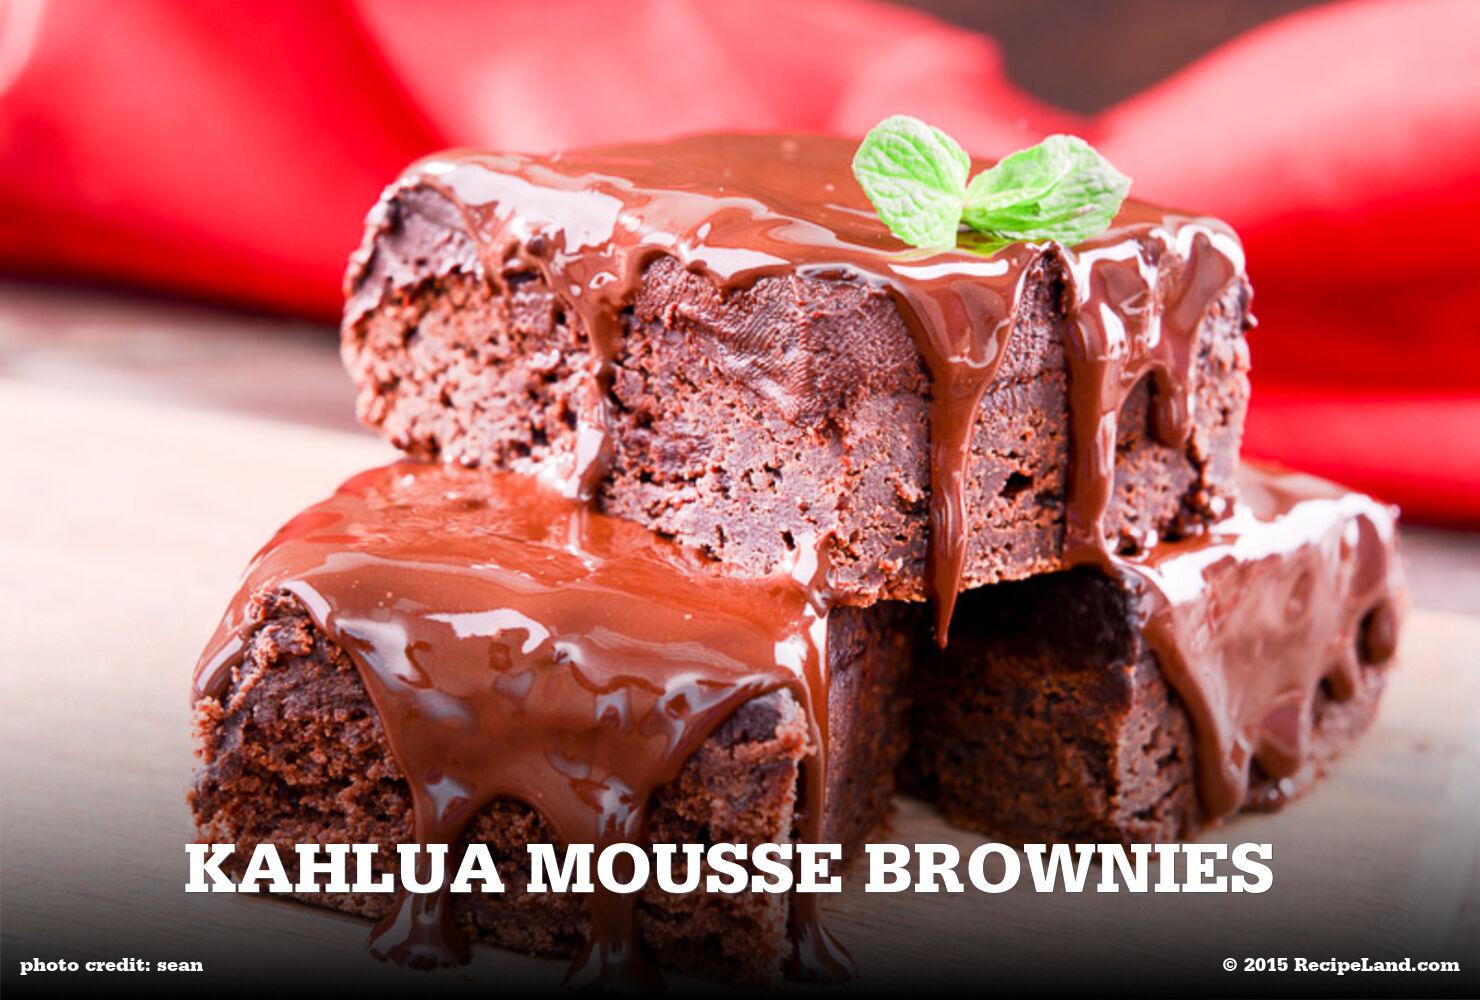 Kahlua Mousse Brownies